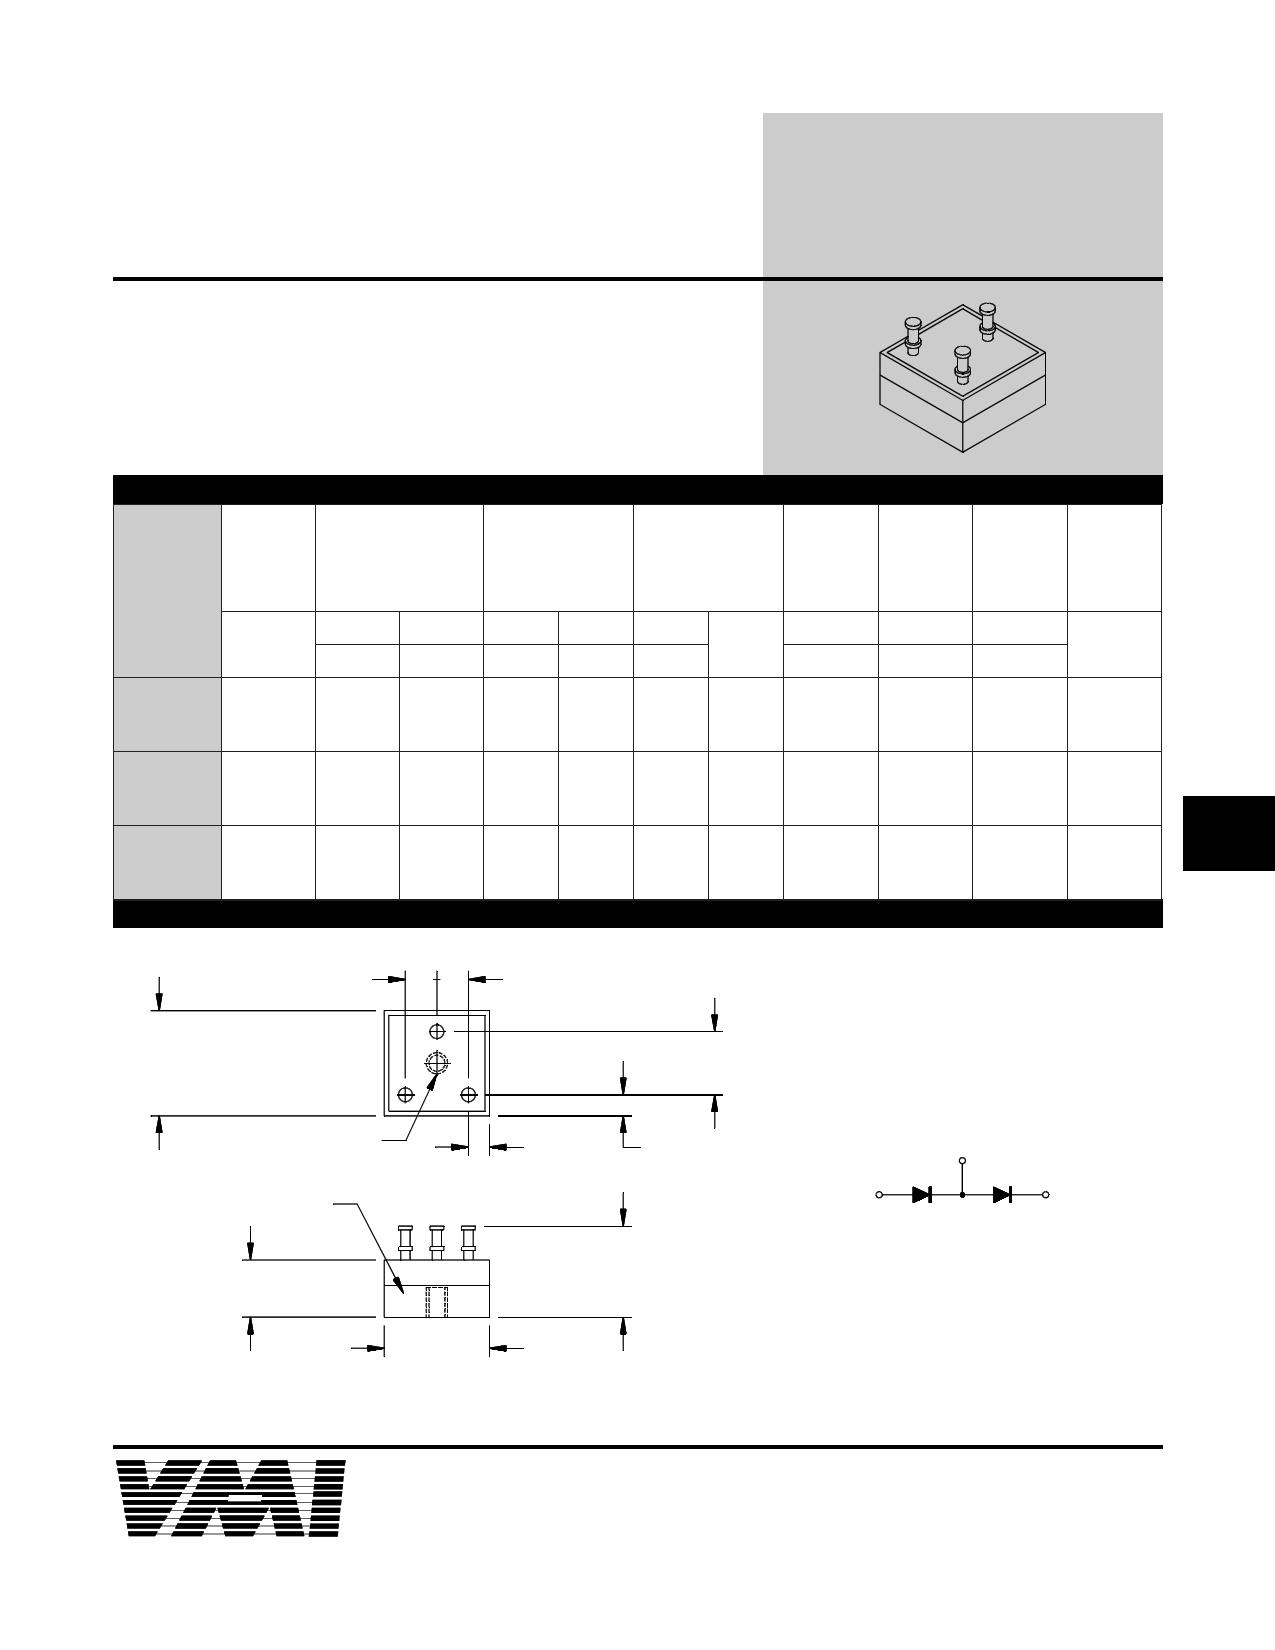 LTI210FD دیتاشیت PDF